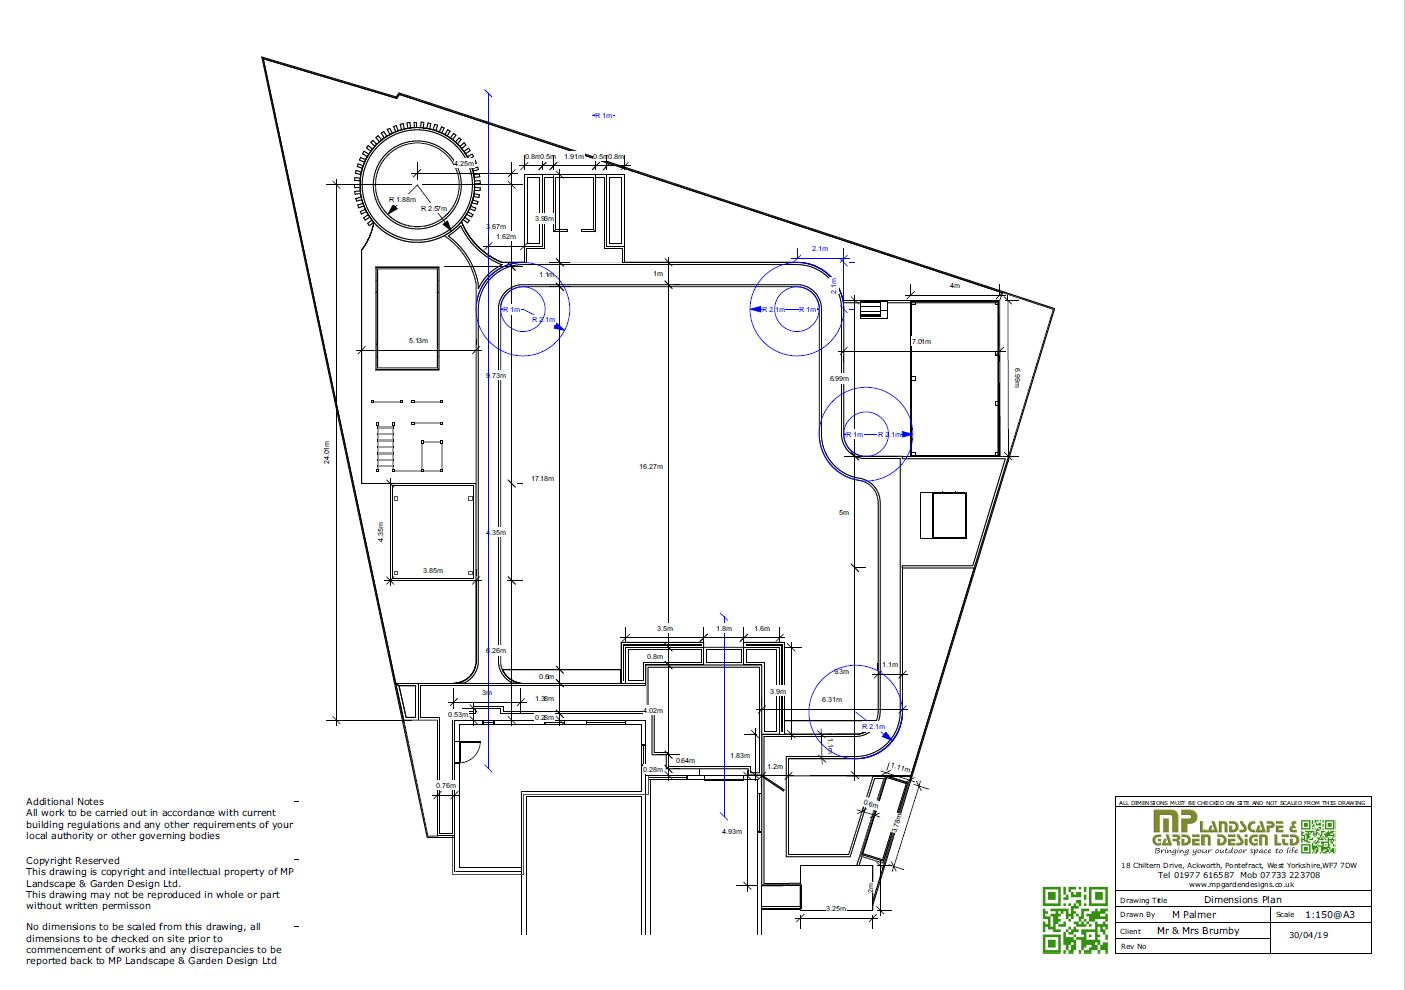 1,Garden layout plans-dimensions for a rear garden in Darrington